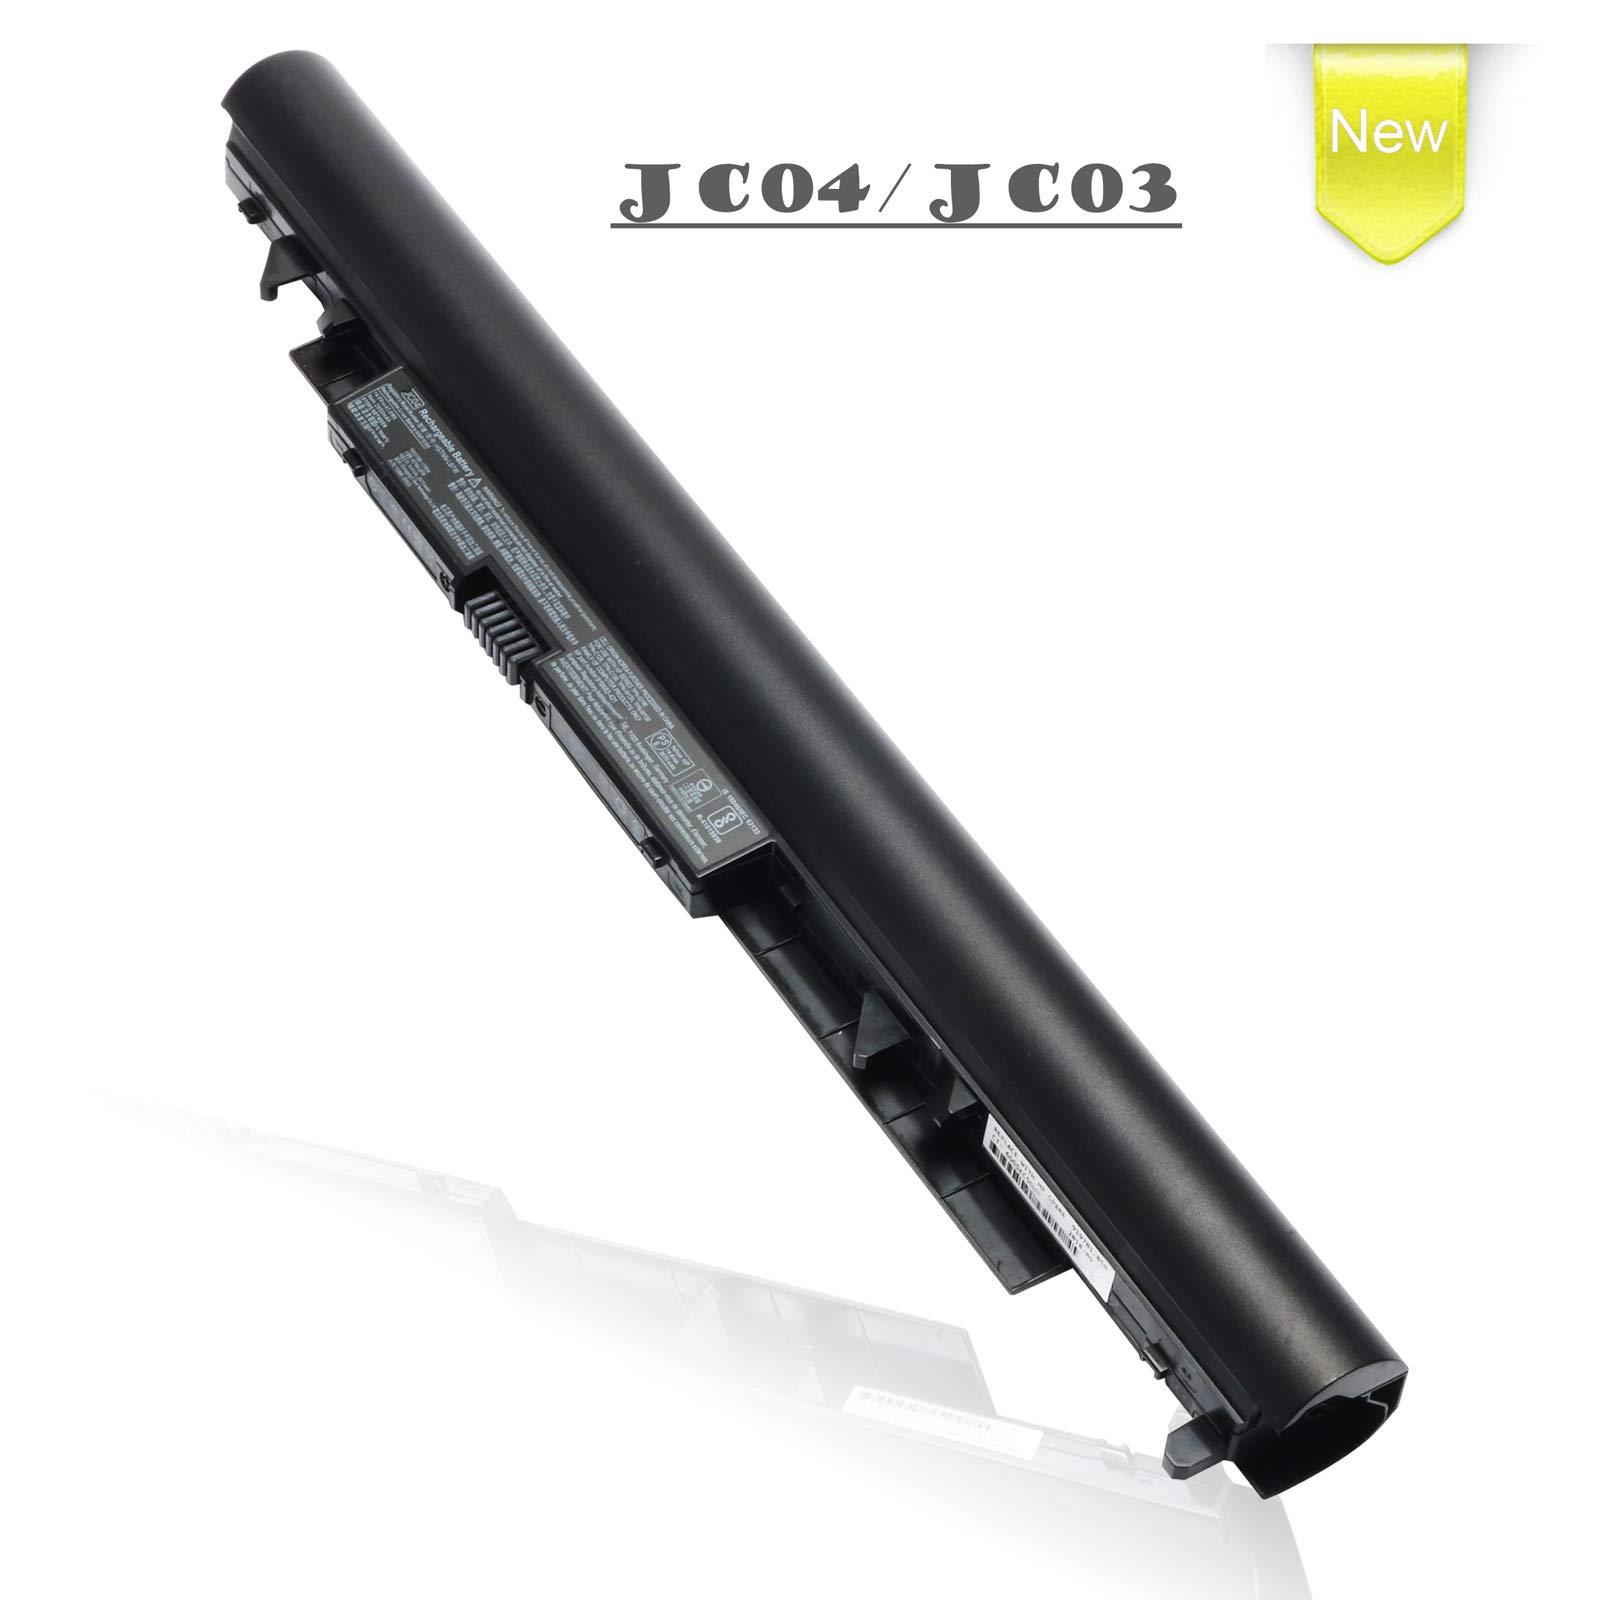 Bateria Jc03 Para Hp 255 G6 250 G6 Pavilion 15-bs000 15- Bw000 17-bs000 17z Series P/n: Jc04 919681-421 Hstnn-lb7v Hstnn